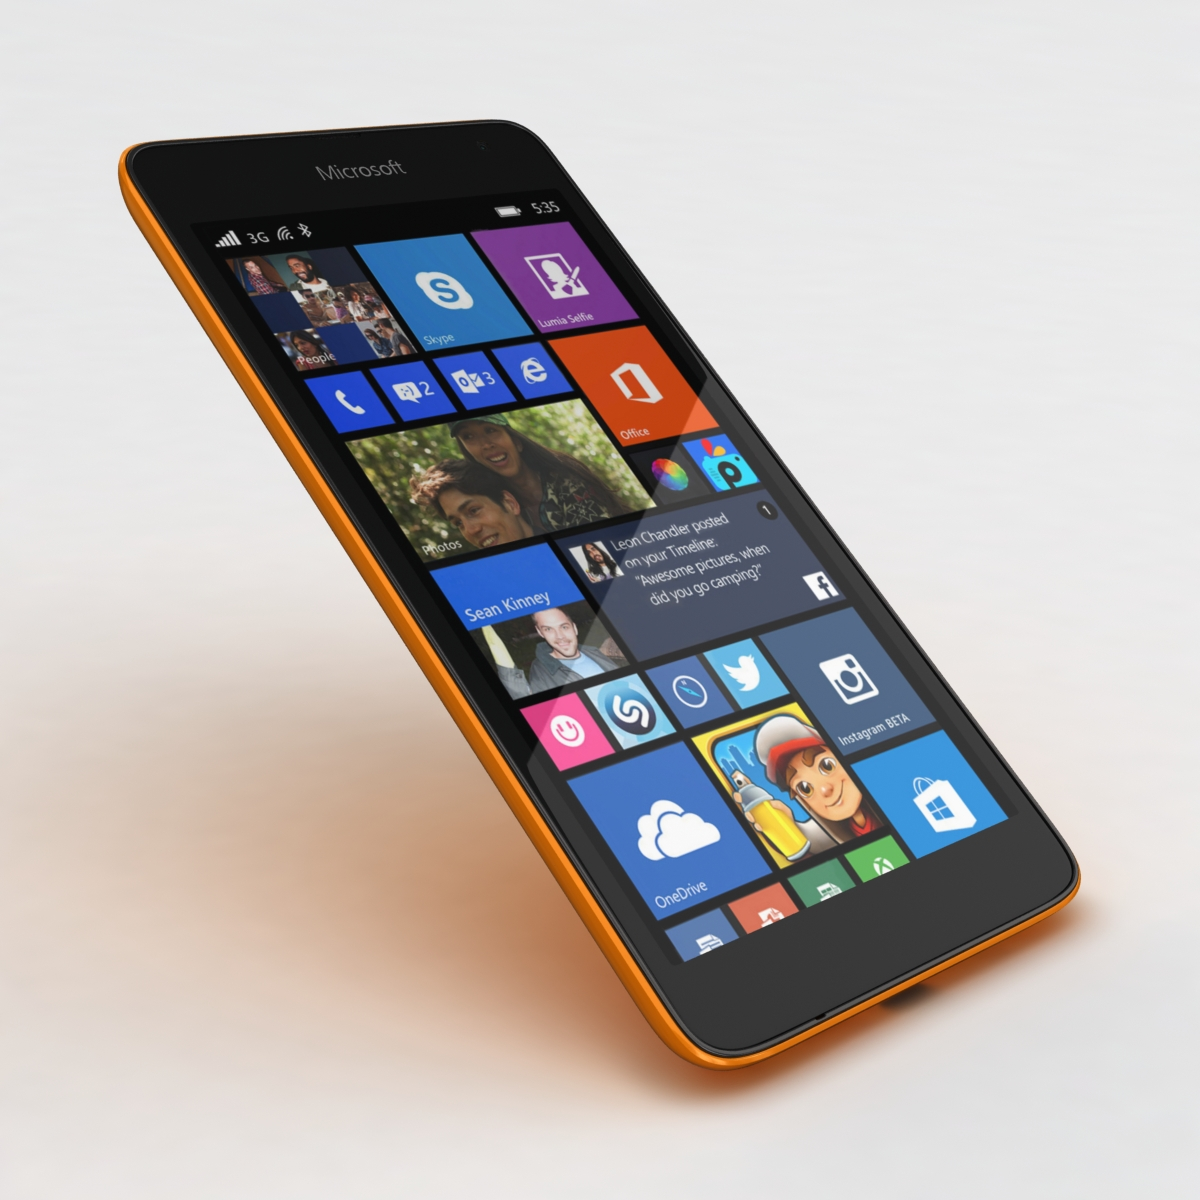 microsoft lumia 535 and dual sim orange 3d model 3ds max fbx c4d obj 204120